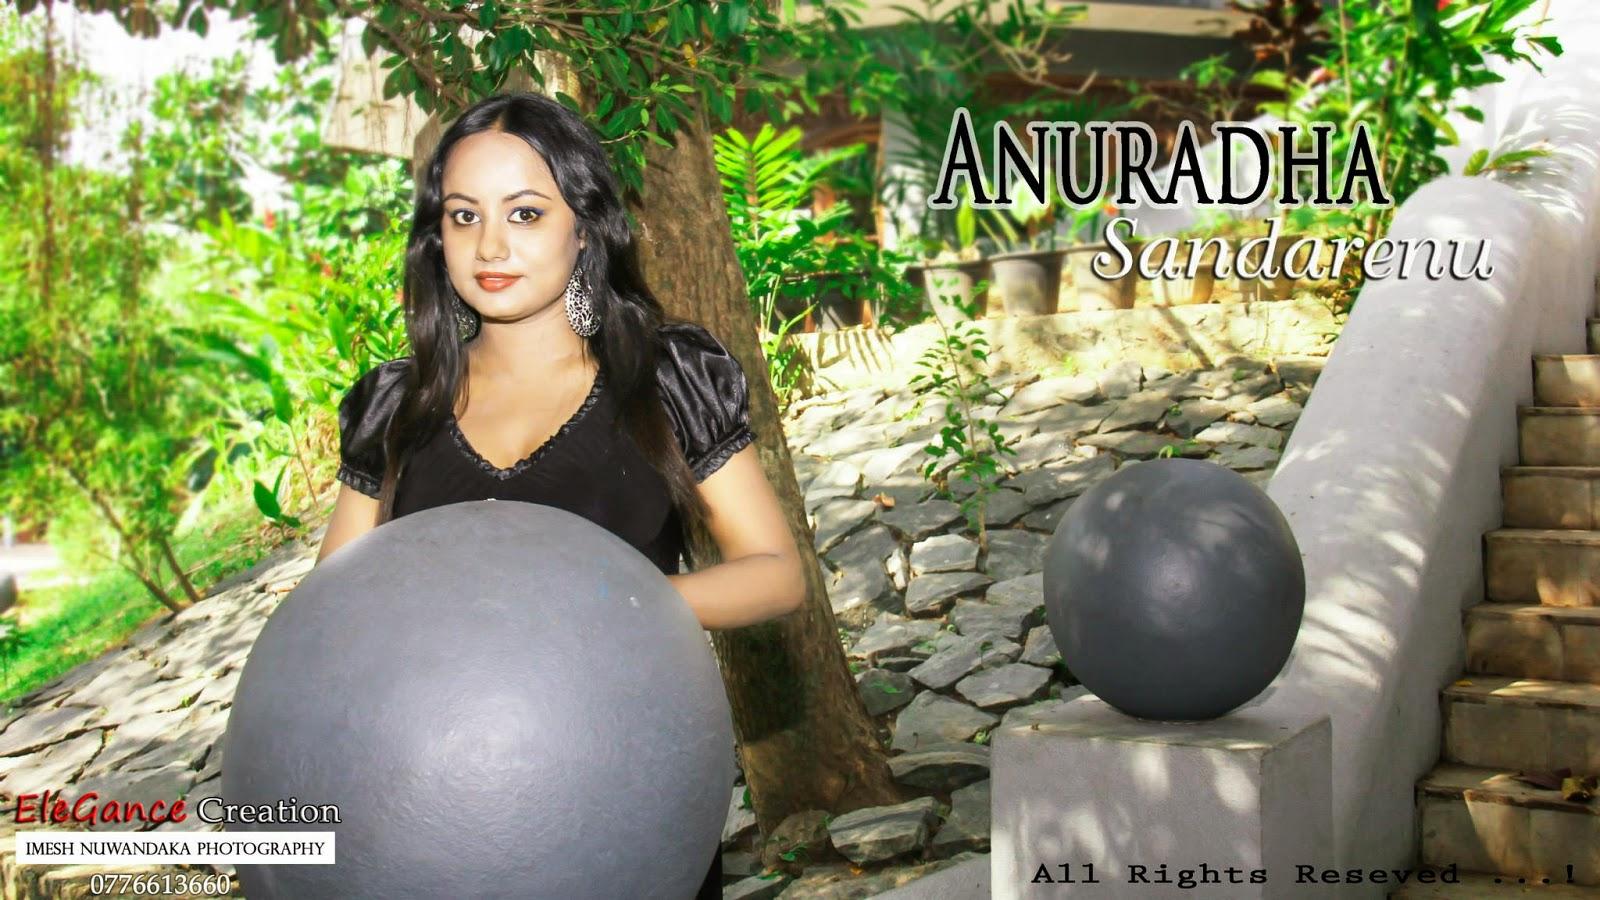 ANURADHA SANDARENU sri lankan model